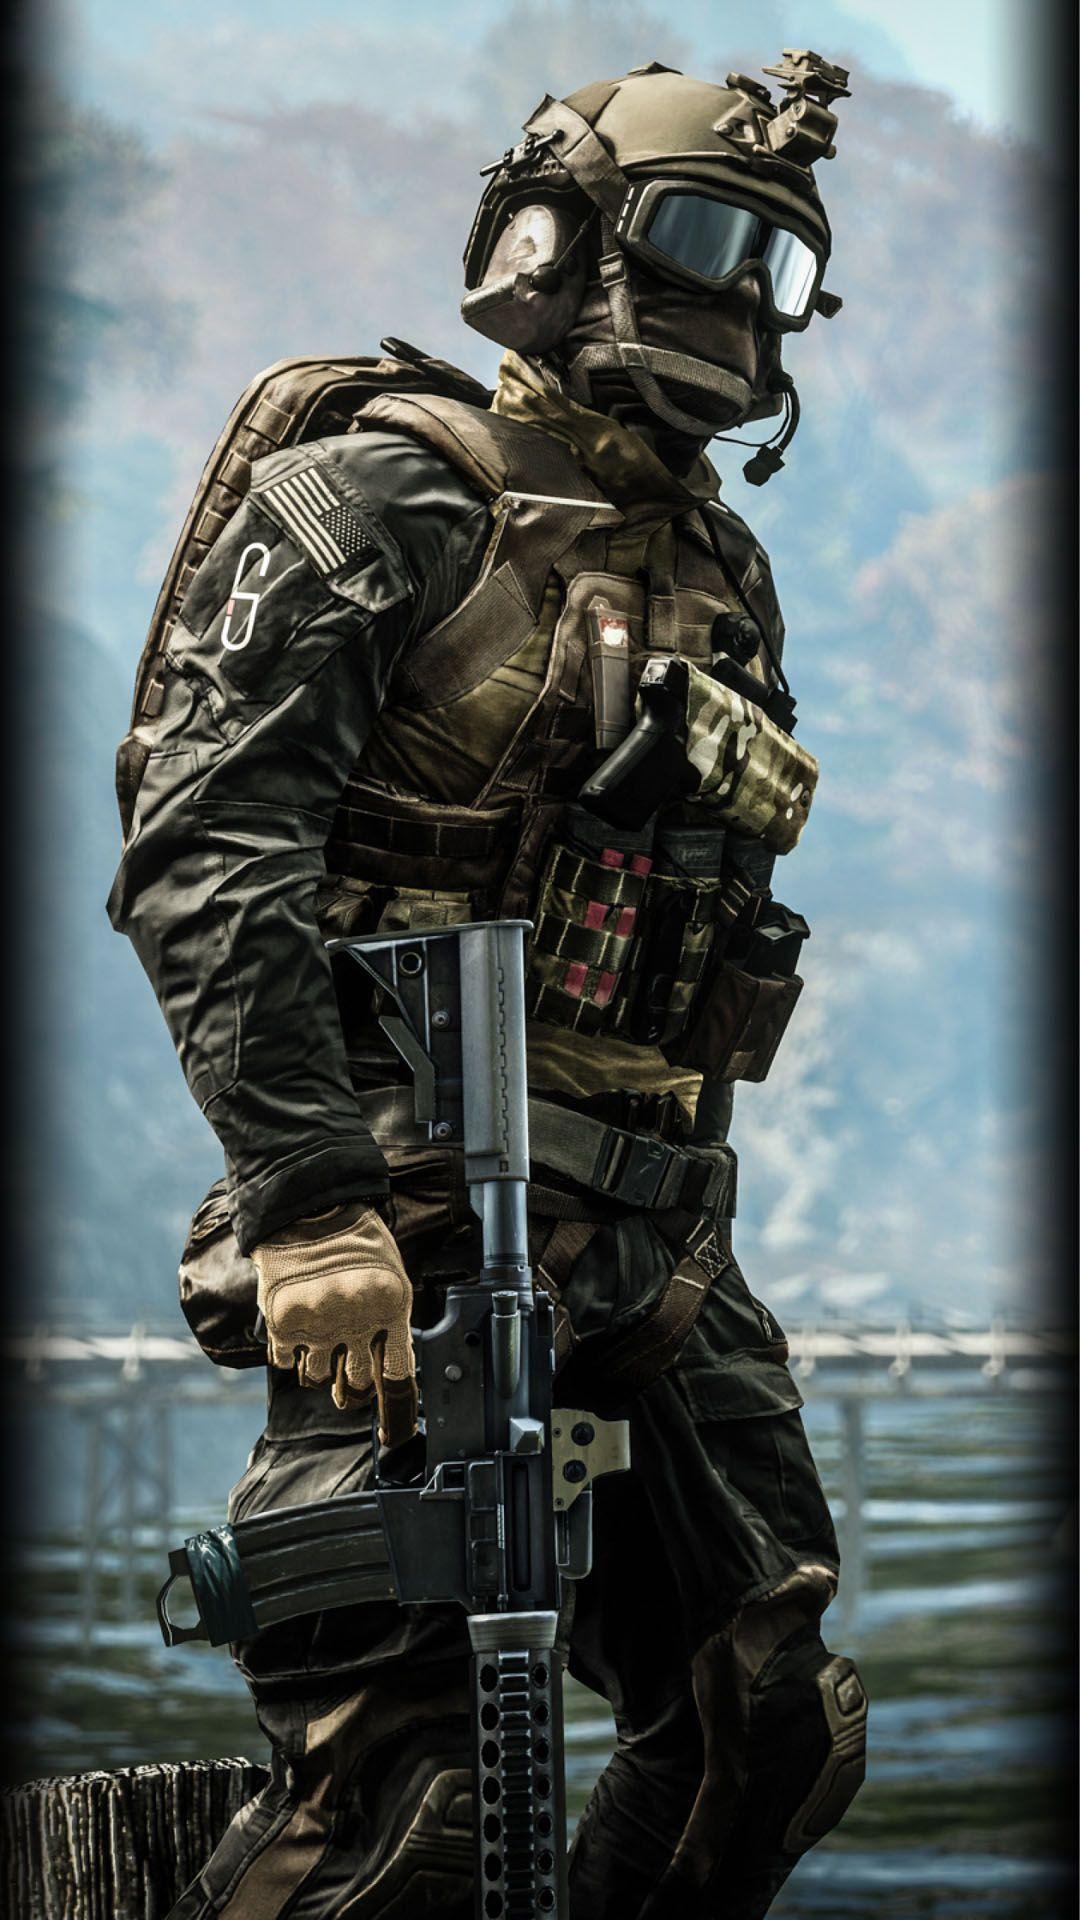 Pin By Bashri On Fantasy Art Army Wallpaper Military Wallpaper Military Special Forces